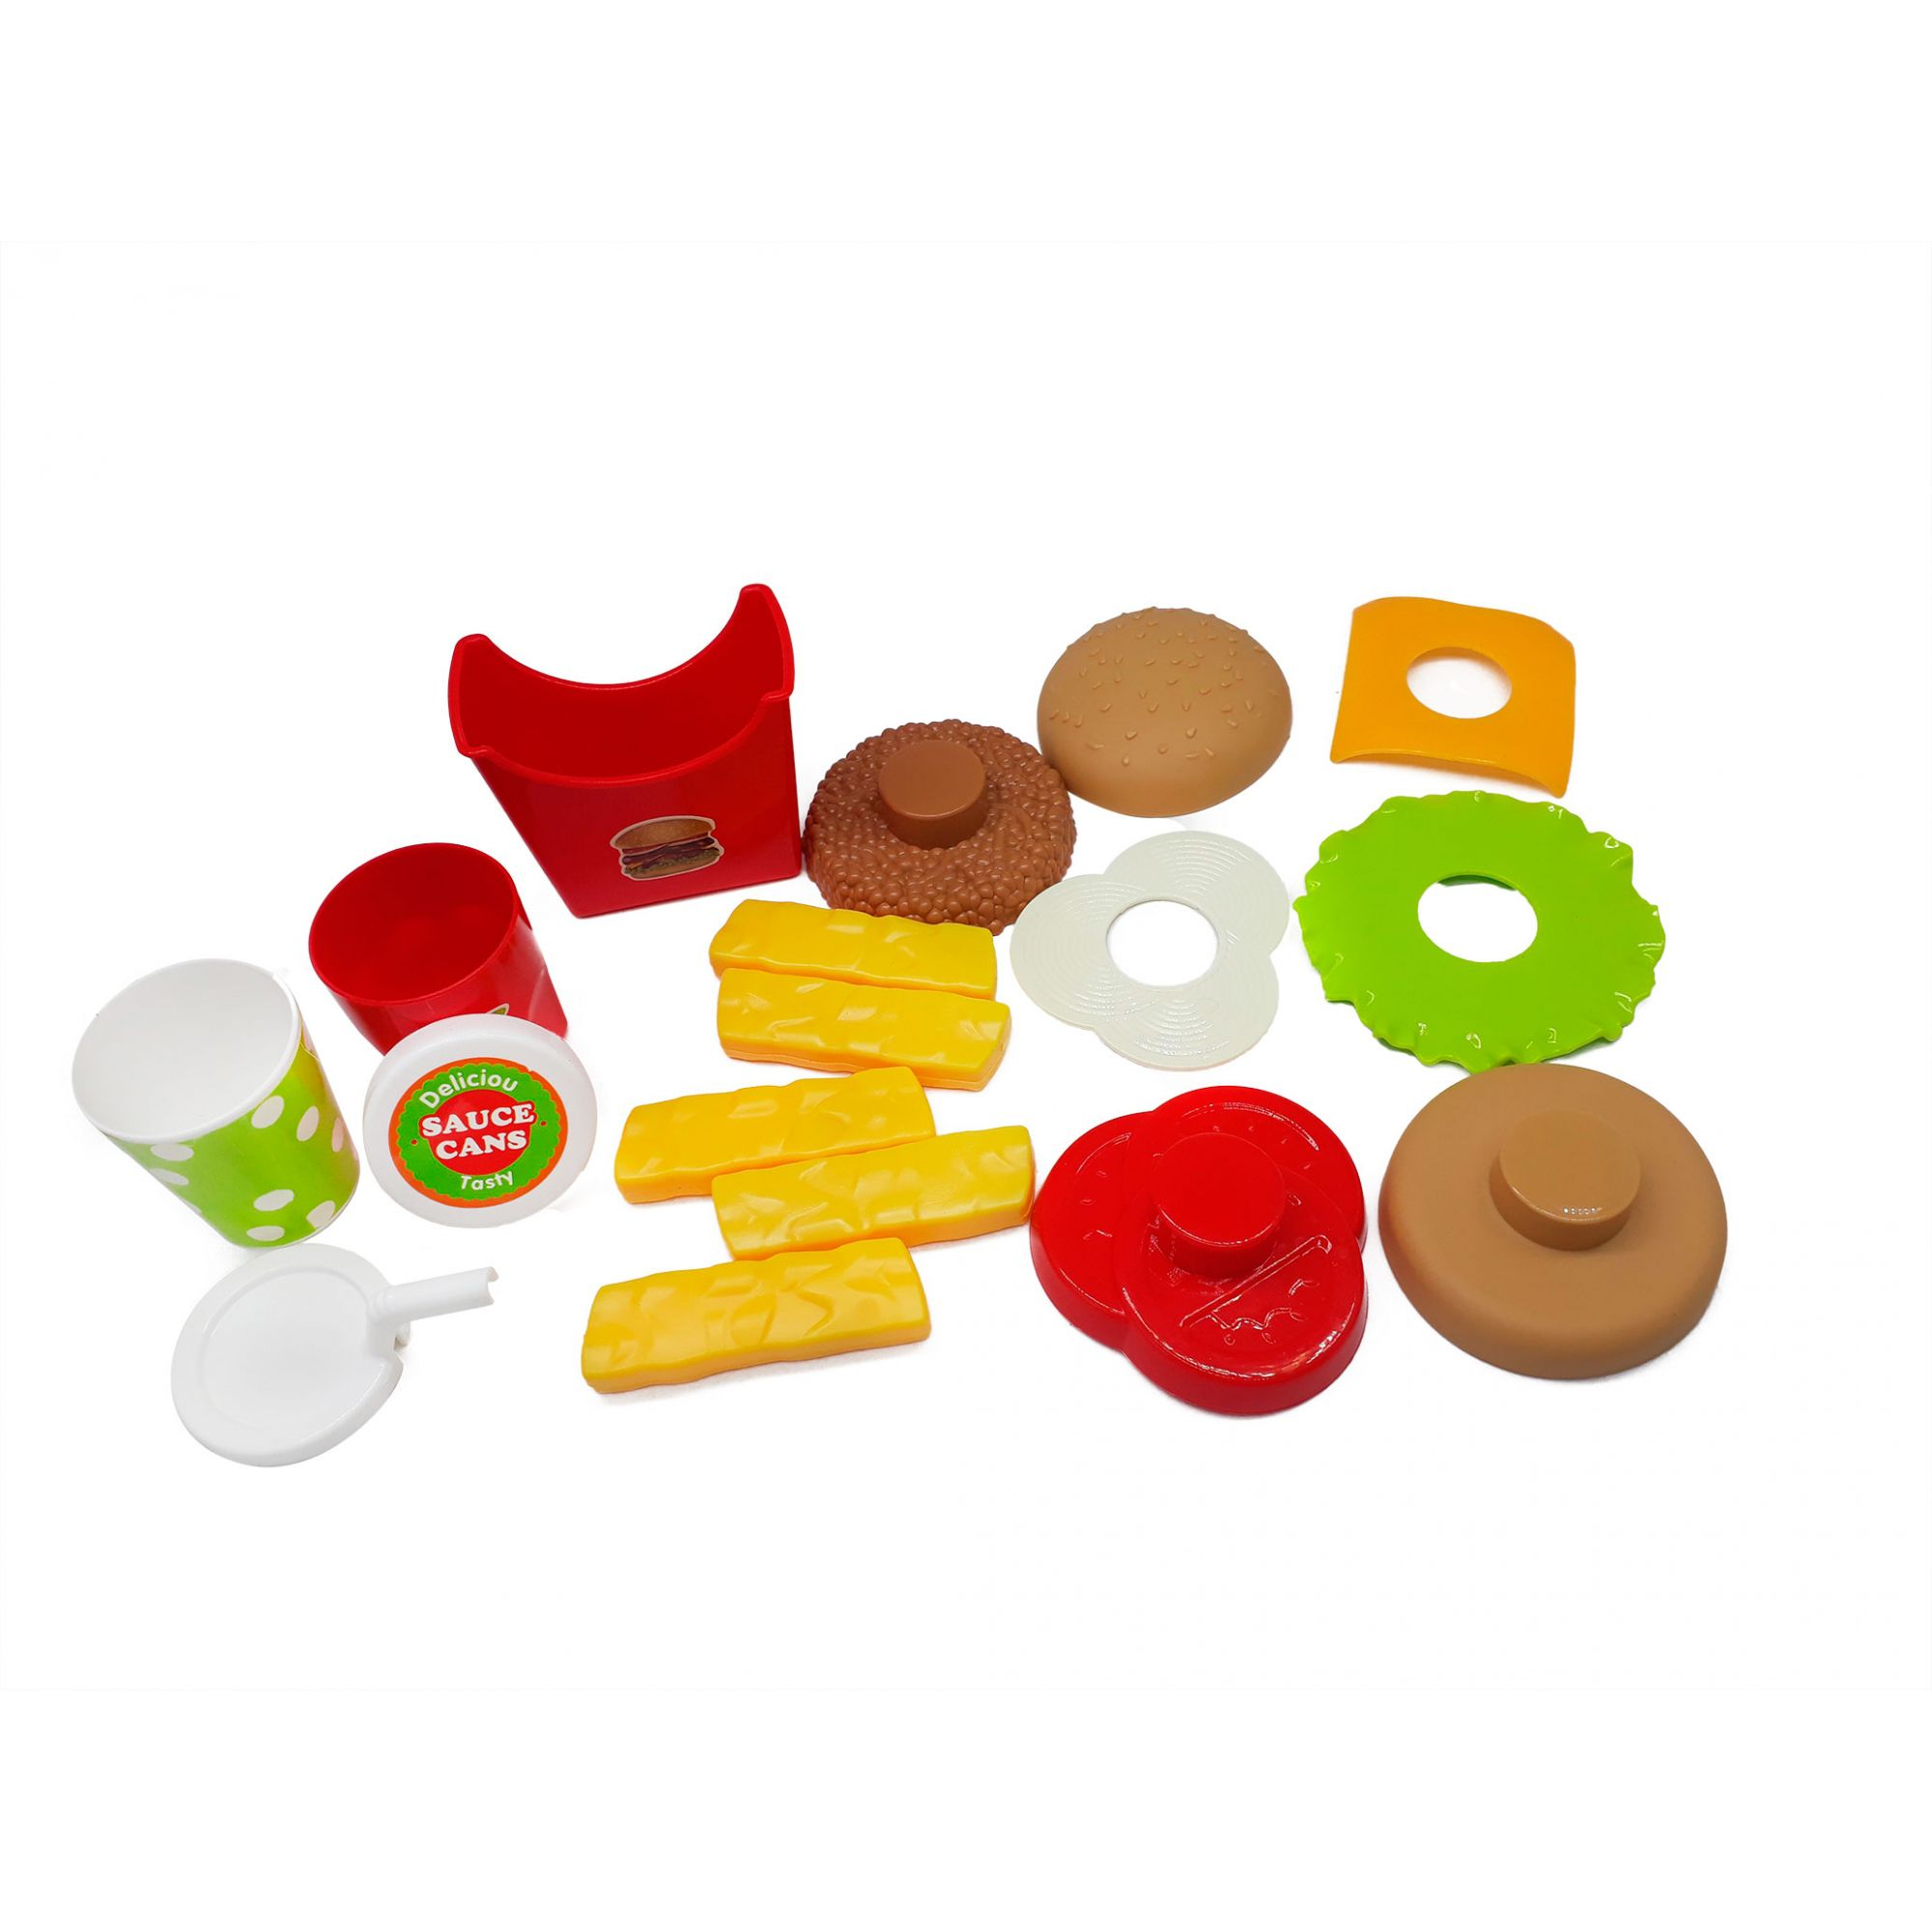 Lanchonete de Brinquedo 15 Peças